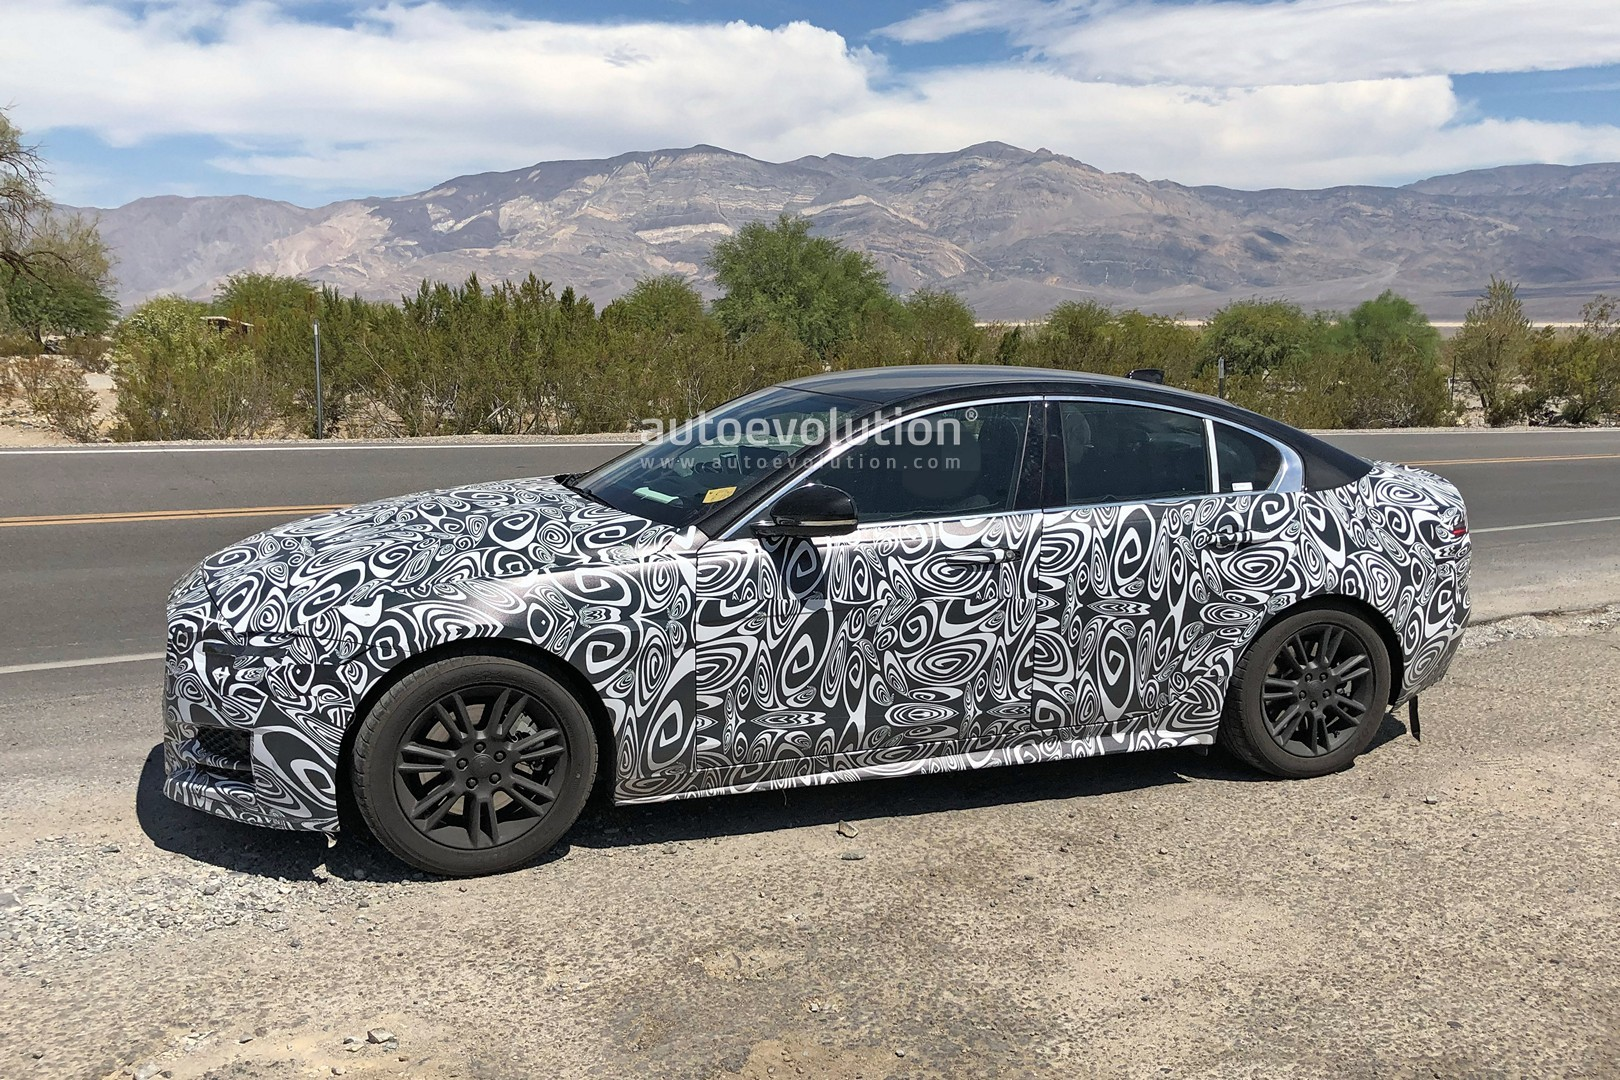 2020 Jaguar Xe Facelift Spied Testing In The Heat Autoevolution